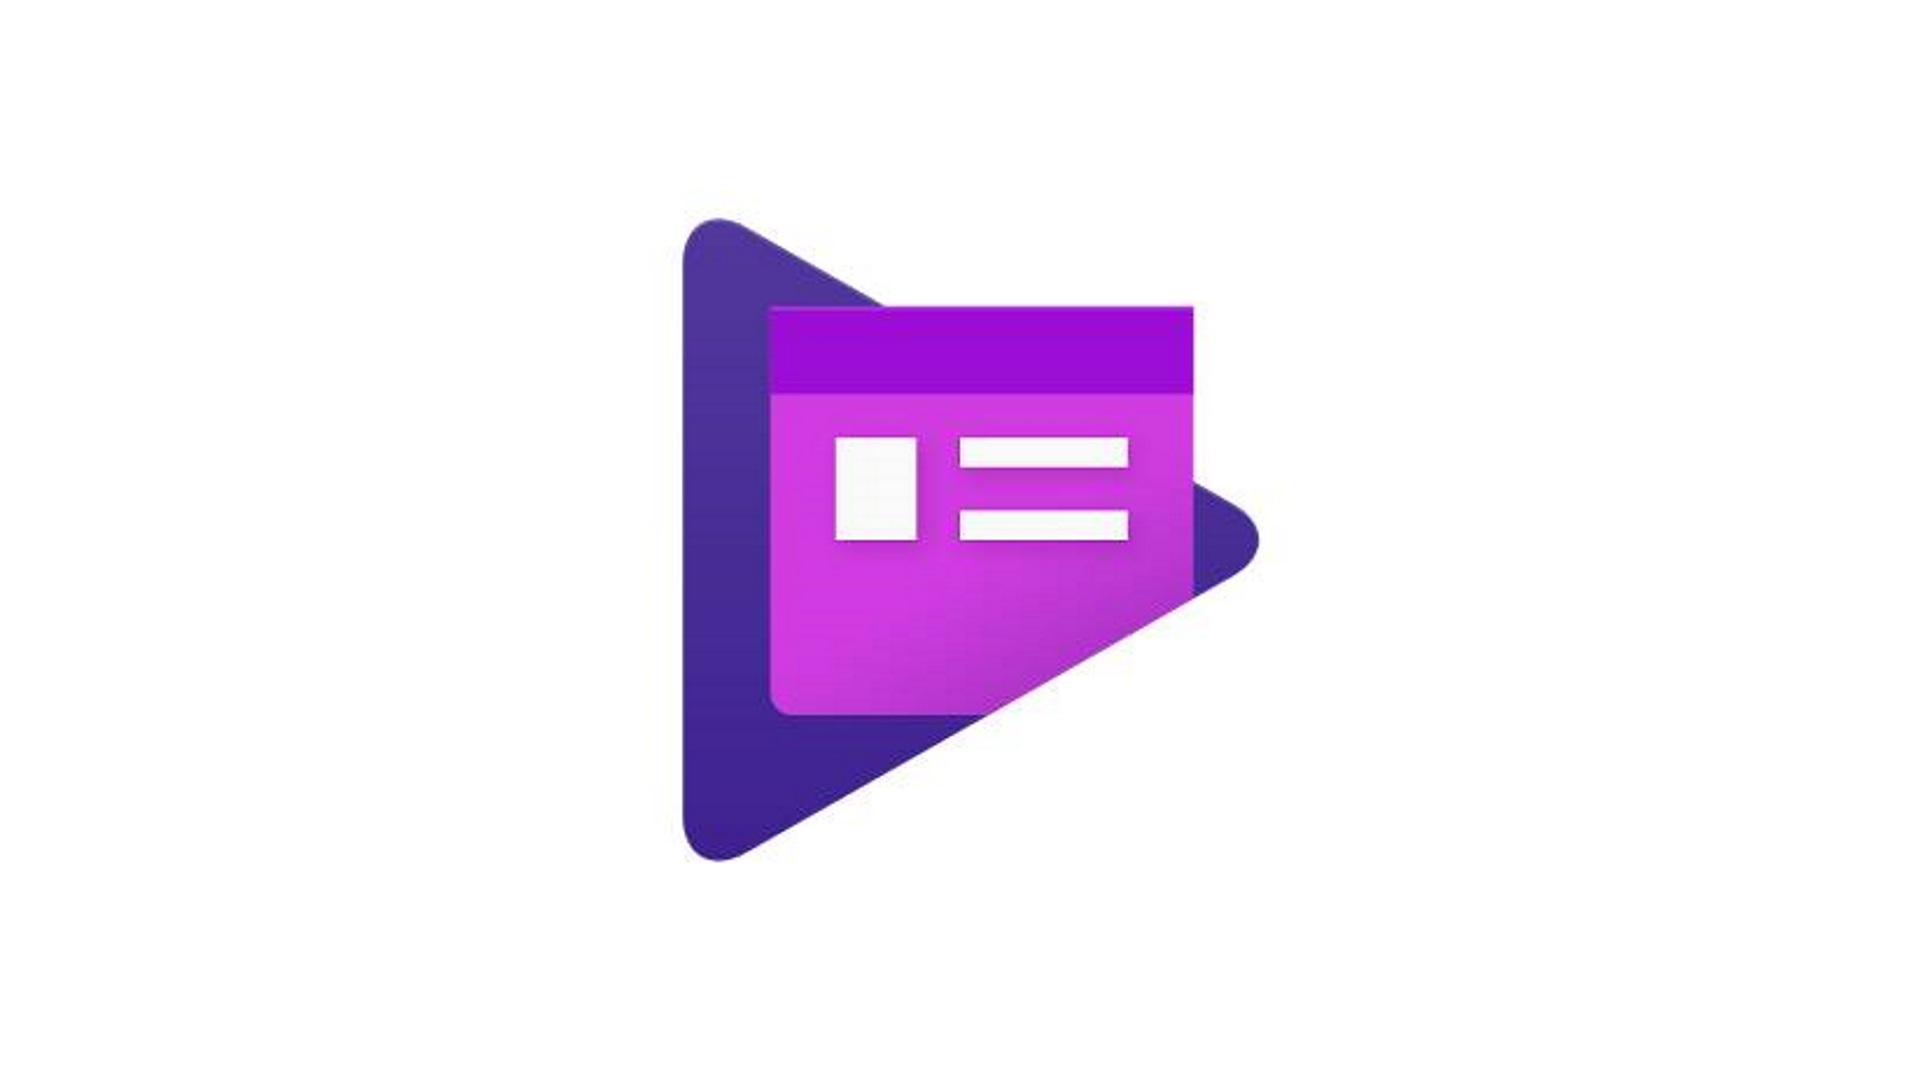 iOS版「Google Play ニューススタンド」v4.7でウィジェットが追加